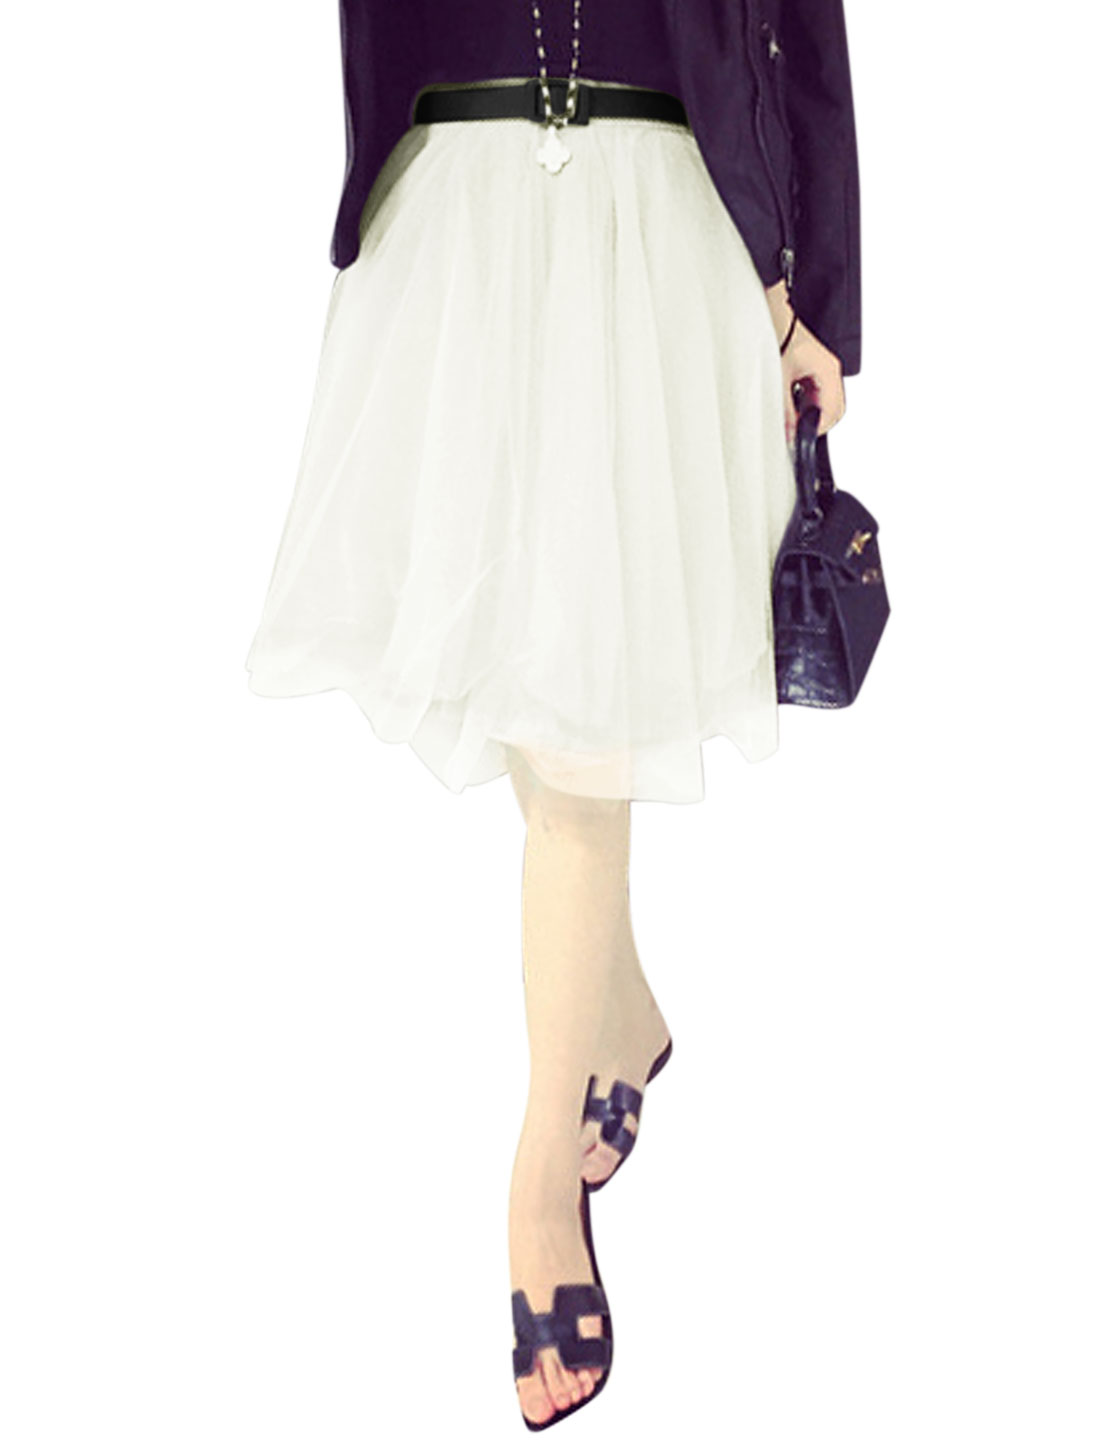 Ladies Mid Rise Elastic Waist Belted Leisure Mesh Skirt White M